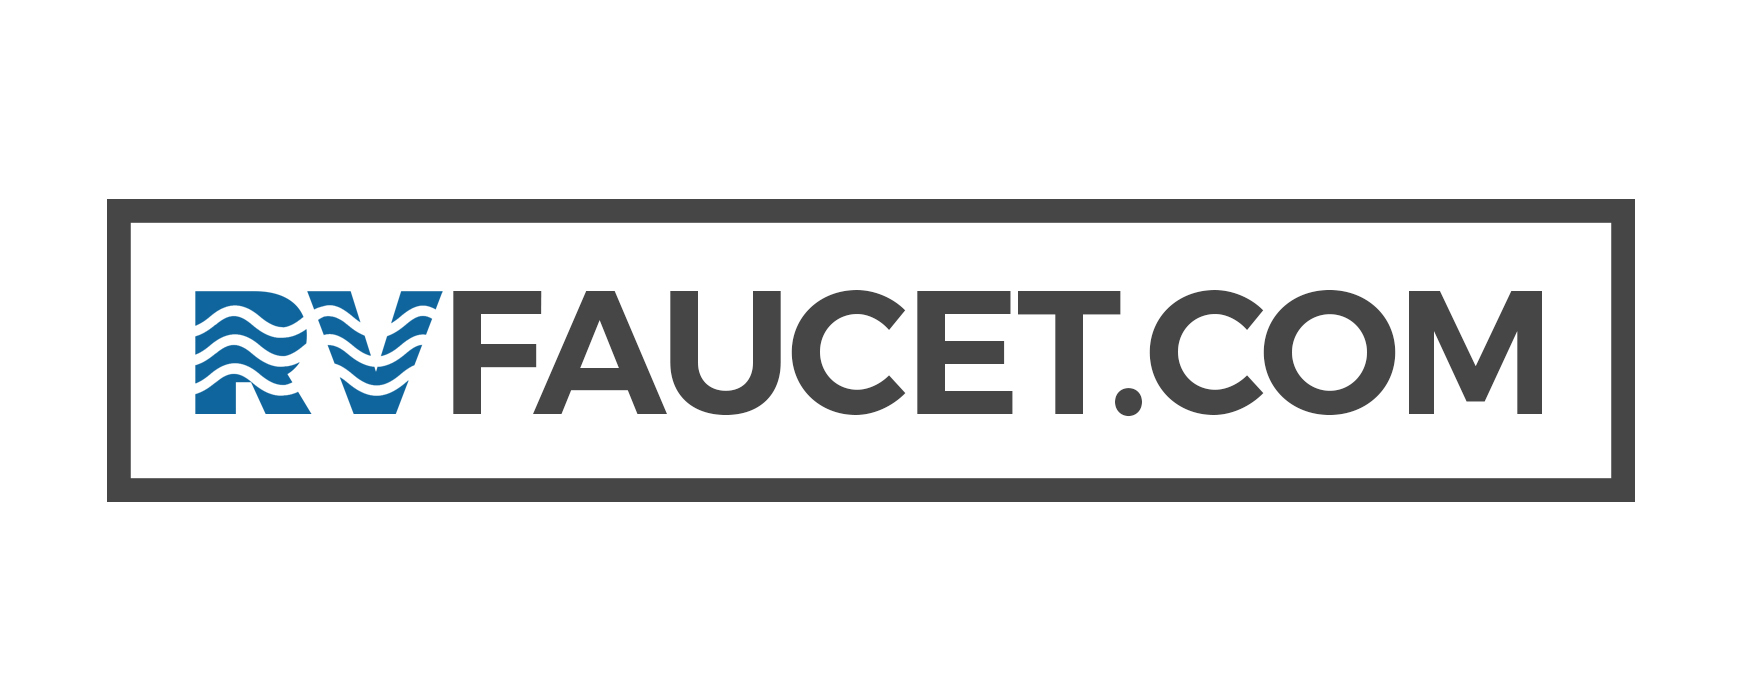 RVFaucet.com